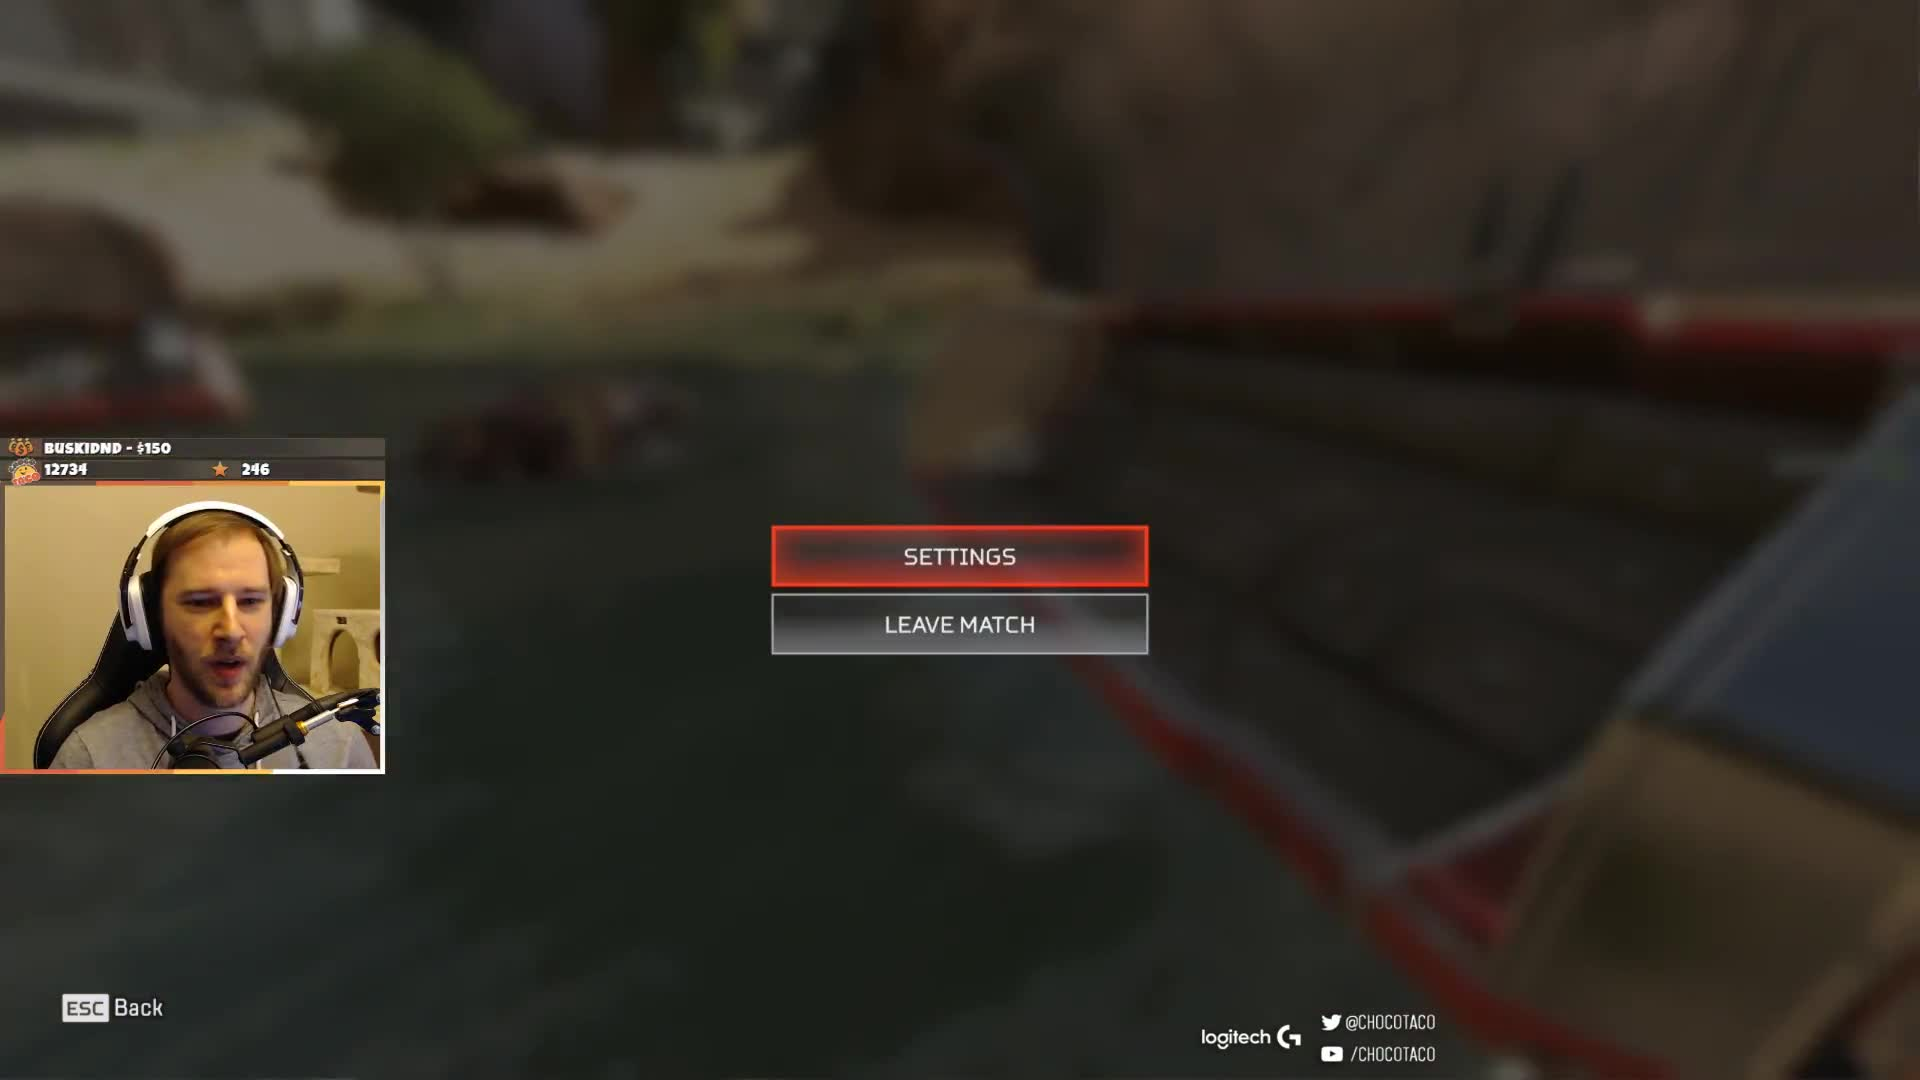 chocoTaco - apex settings - Twitch